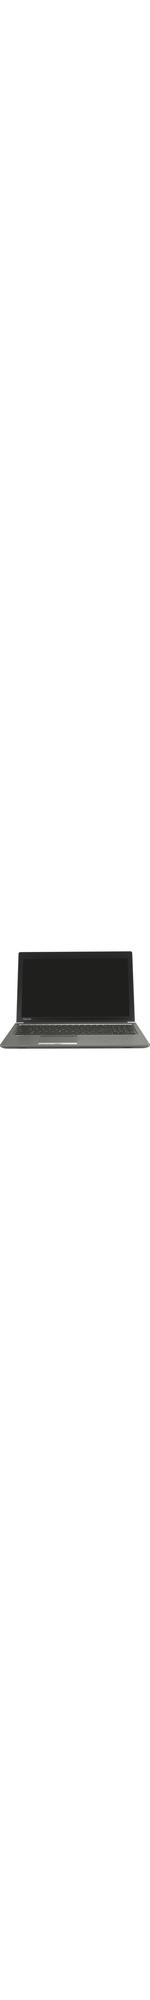 Toshiba Tecra Z50-A Z50-A-197 39.6 cm 15.6And#34; LED Ultrabook - Intel Core i5 i5-4210U 1.70 GHz